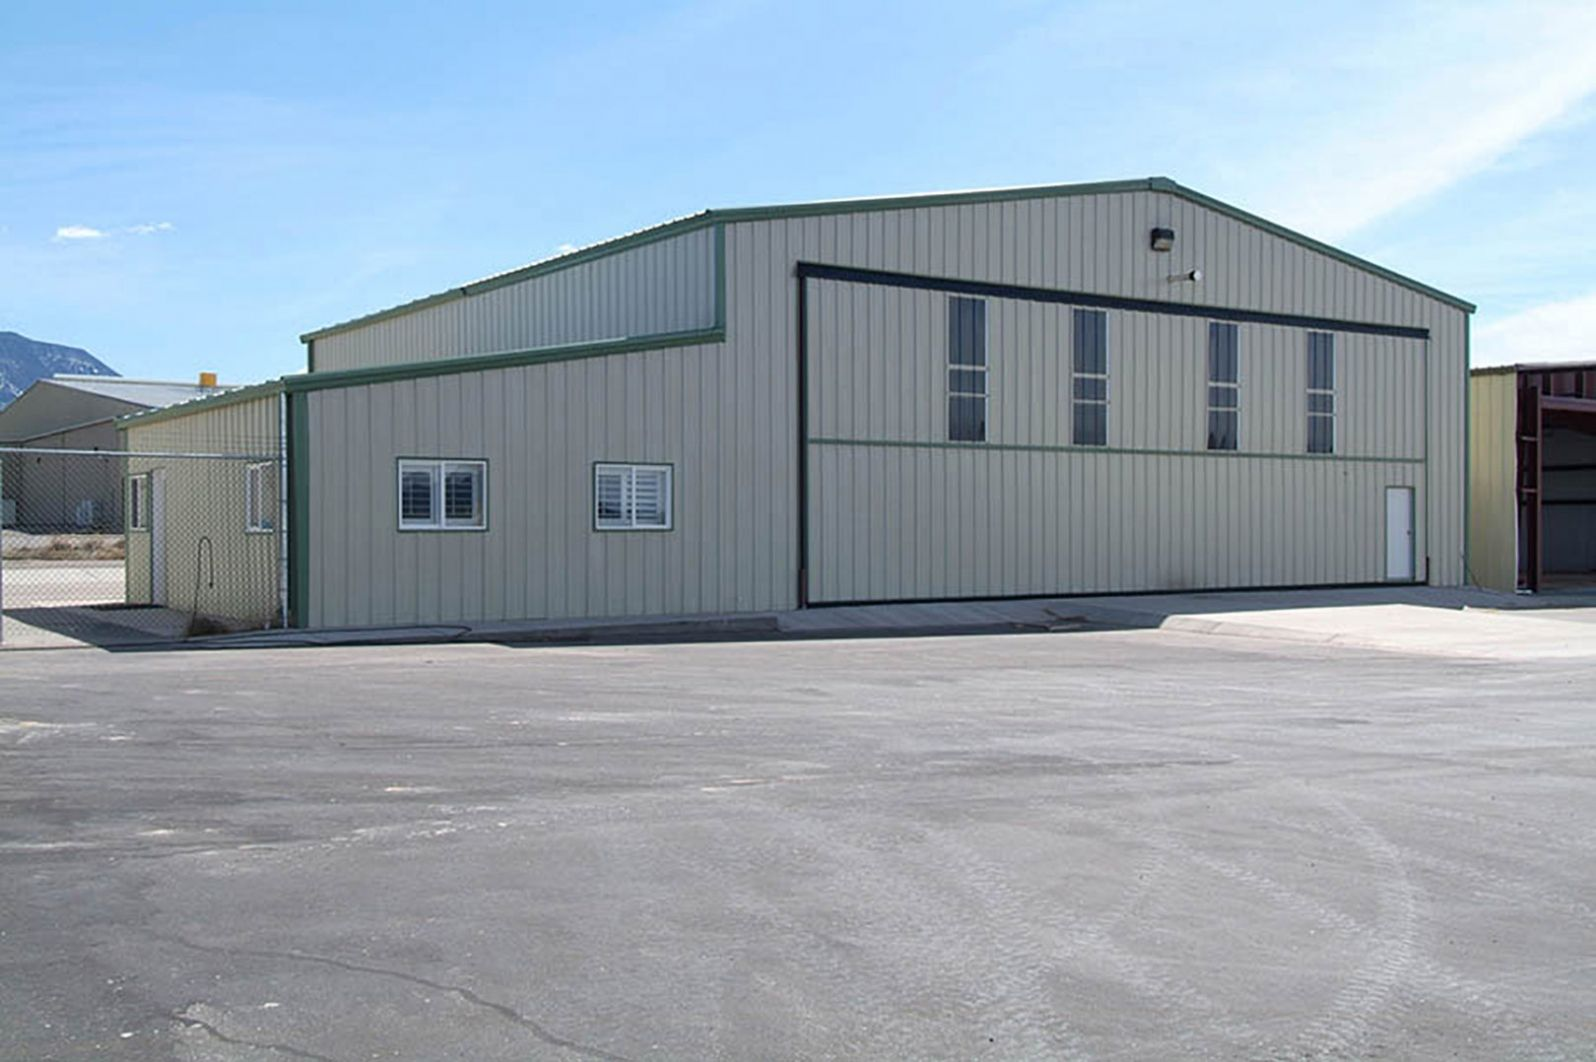 Aircraft Hangar Metal Buildings in 2020 Metal buildings